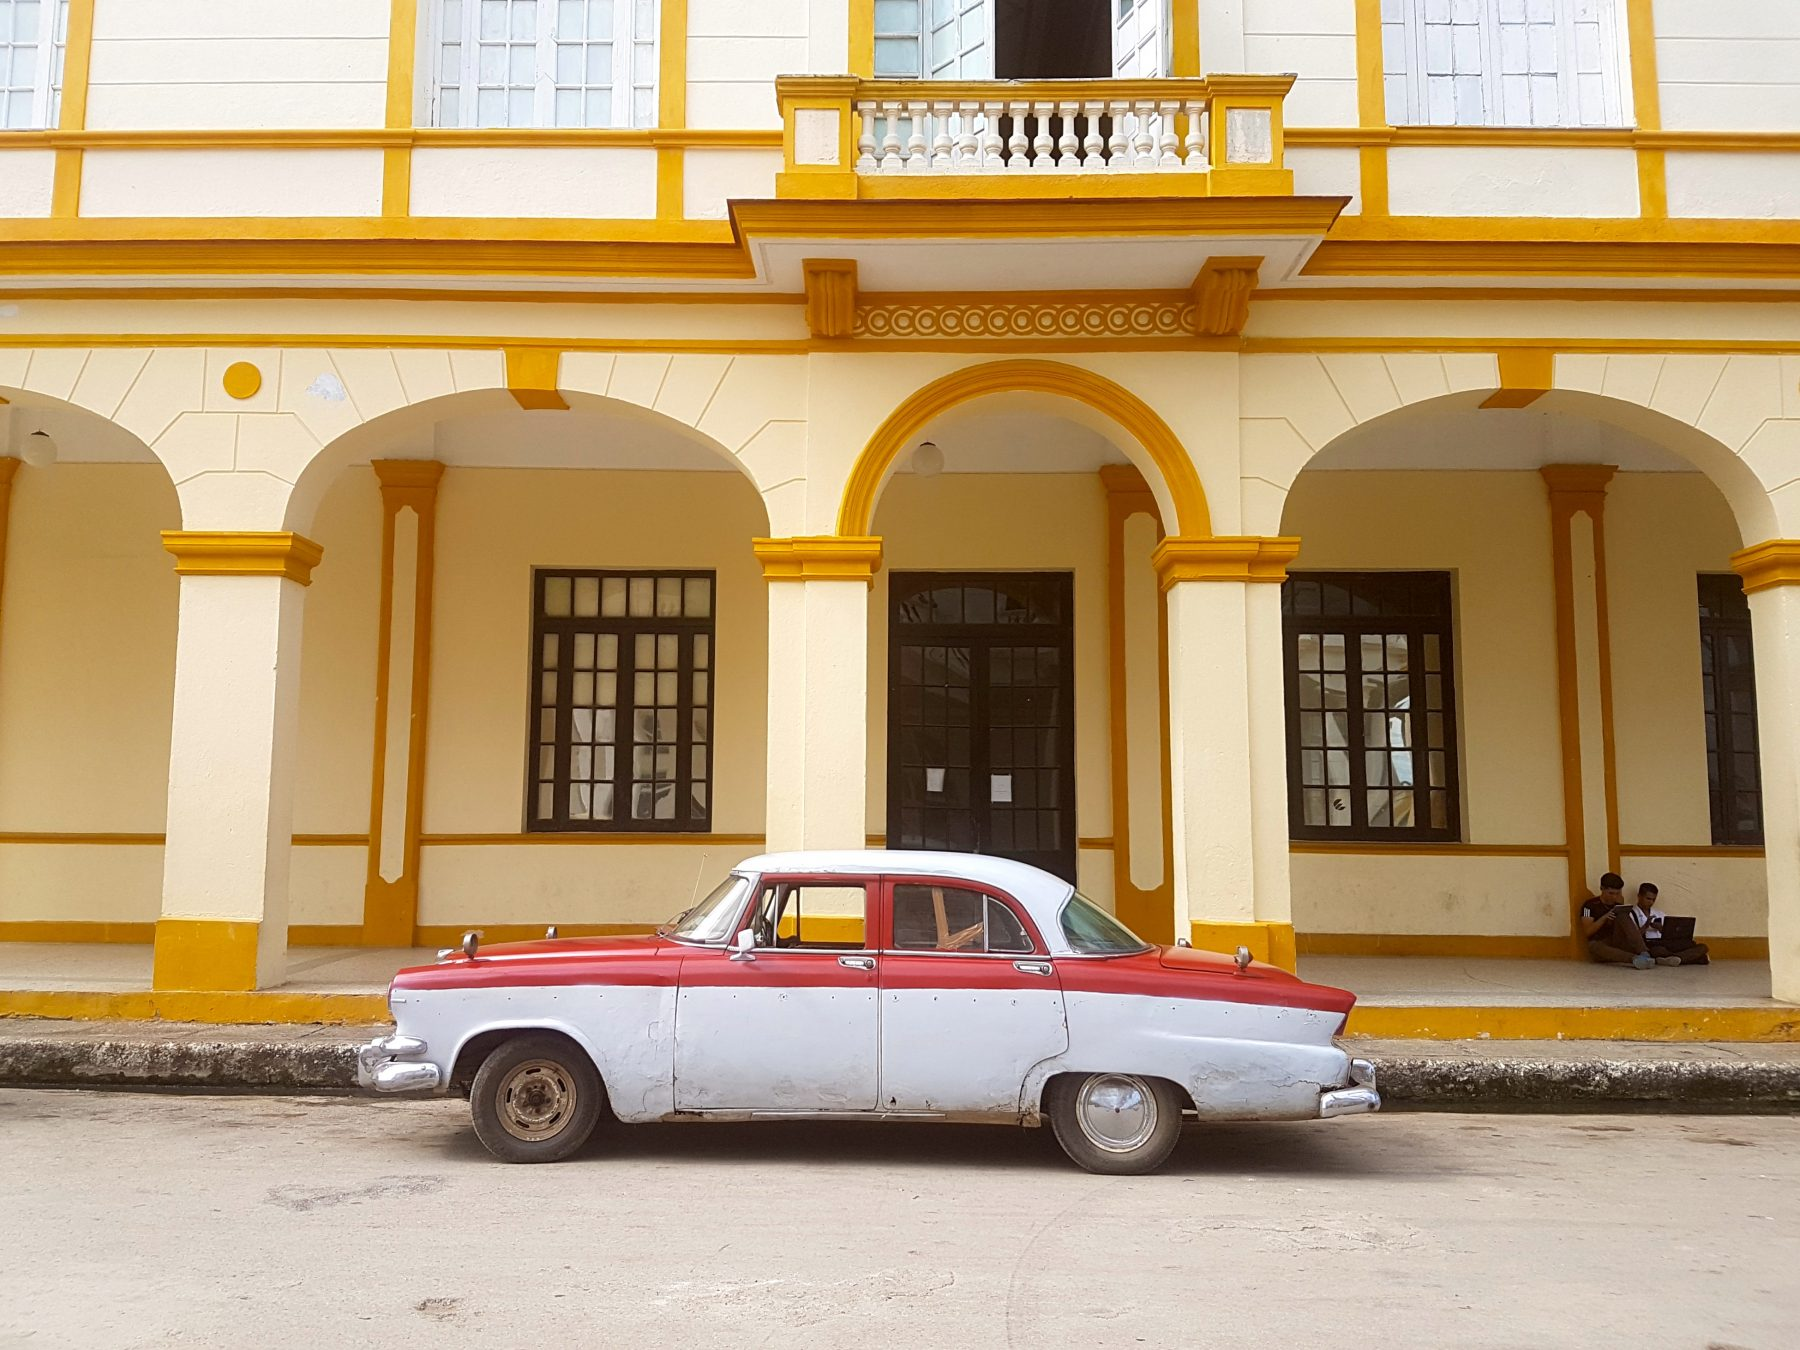 Cuba après Irma, ville